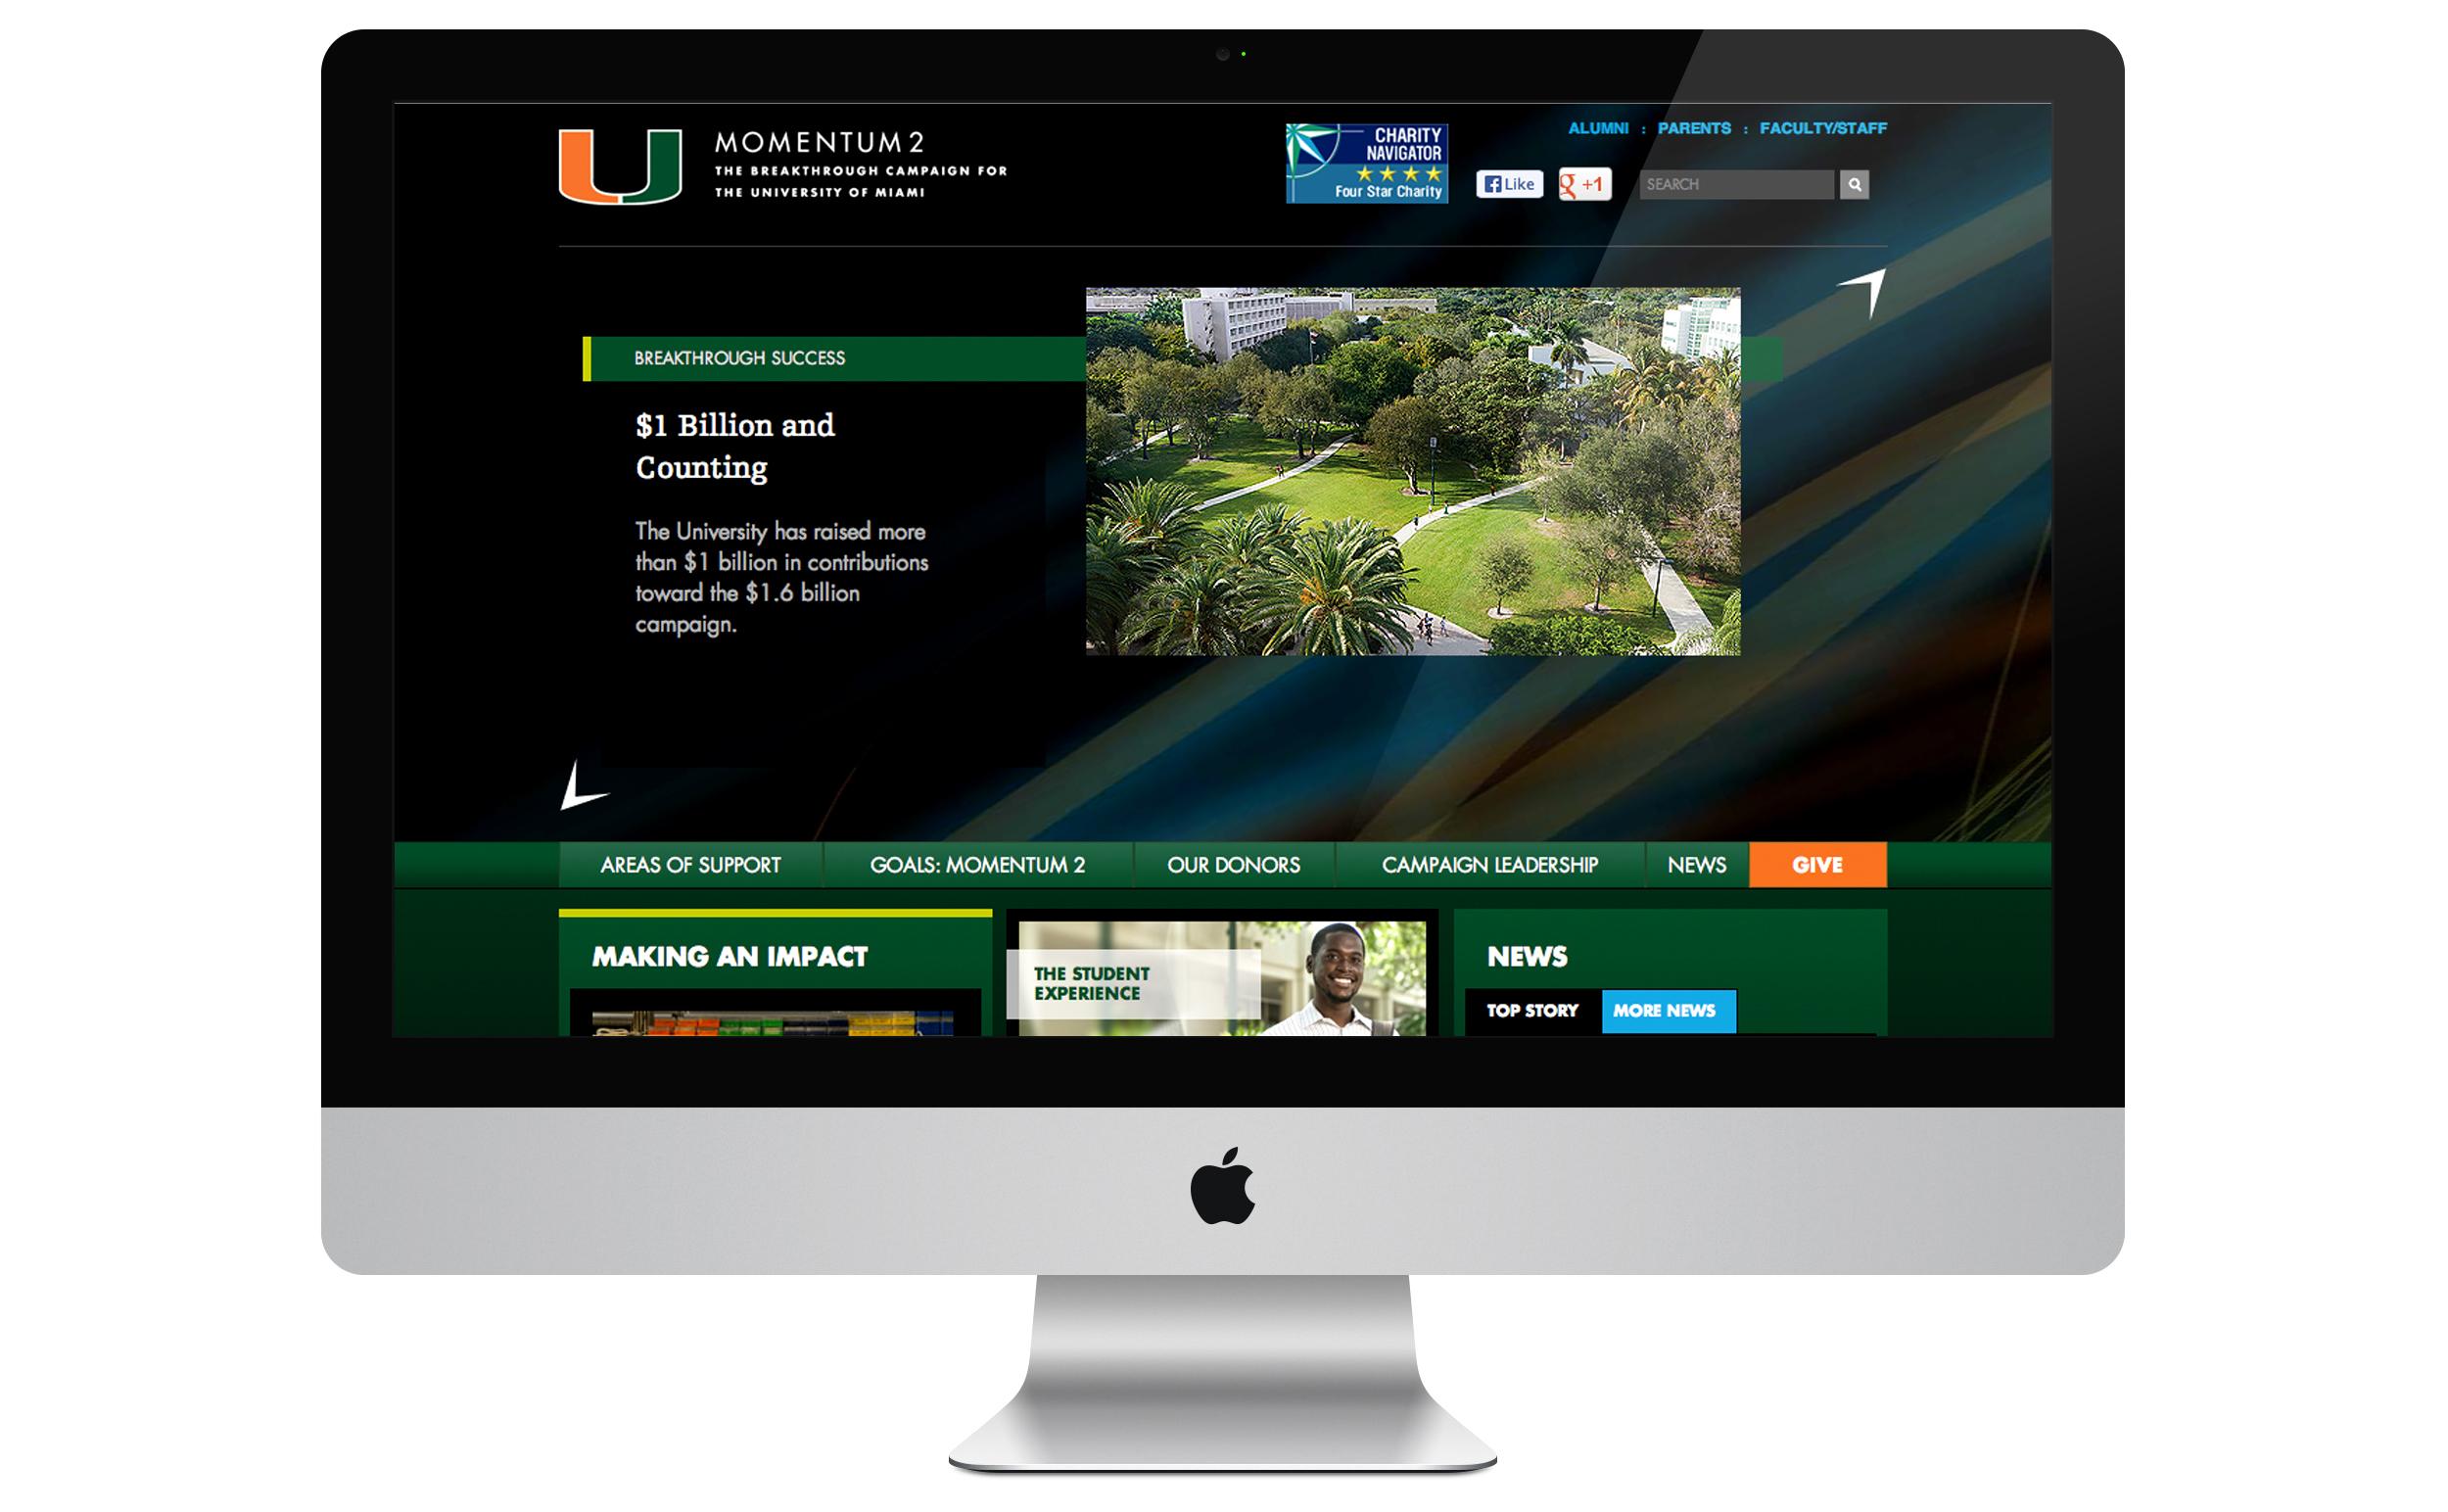 iMac Frame_HomePage3_UMiami.jpg